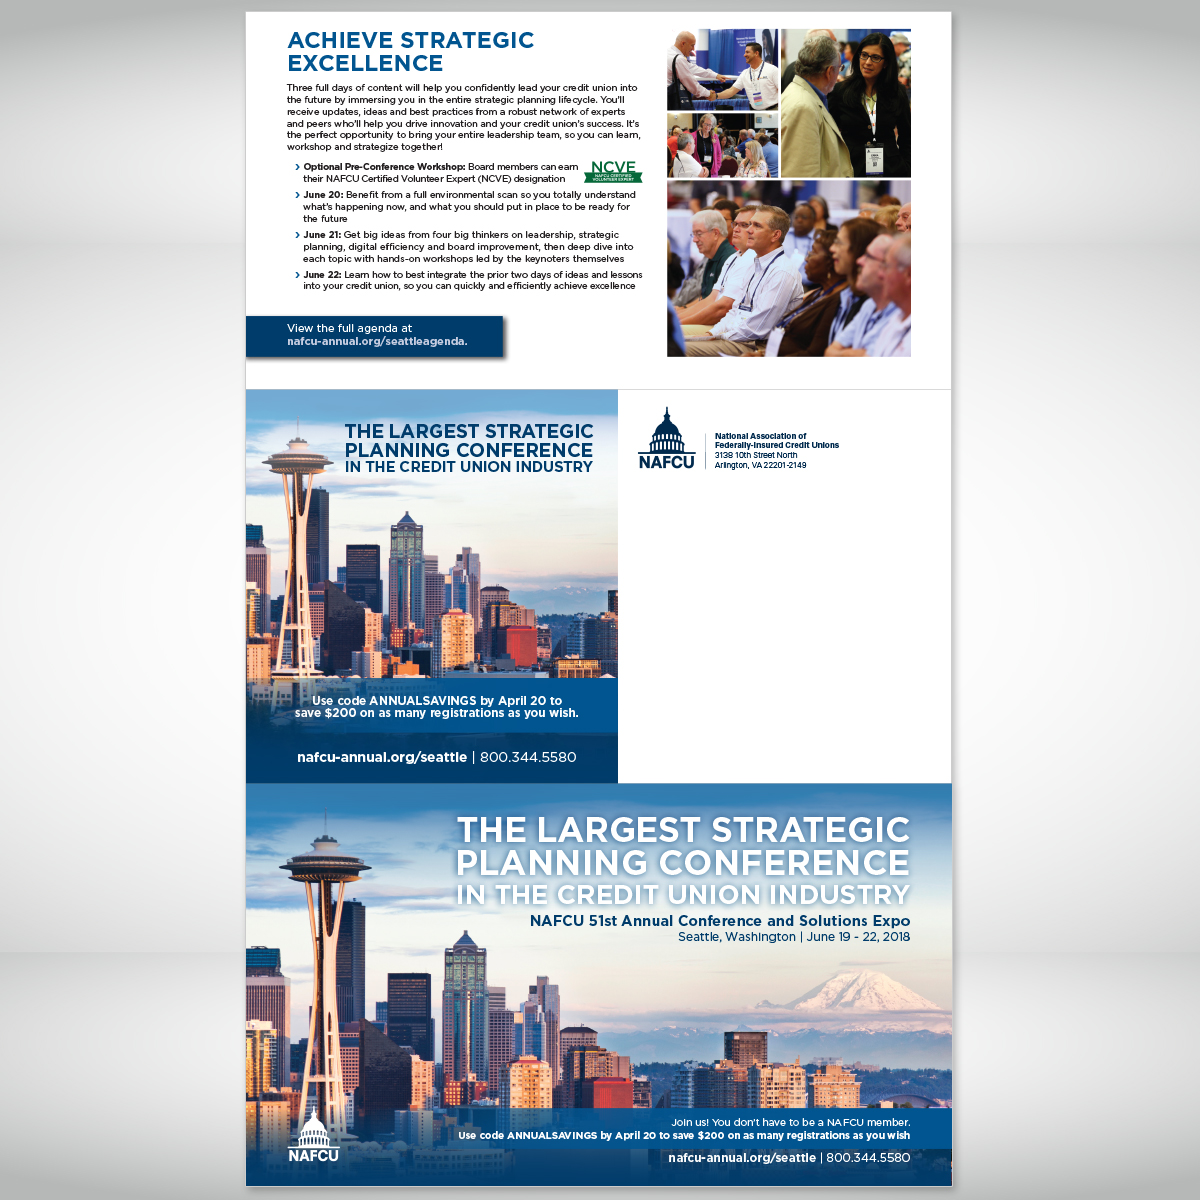 NAFCU Annual Conference 2018 Brochure (outside)